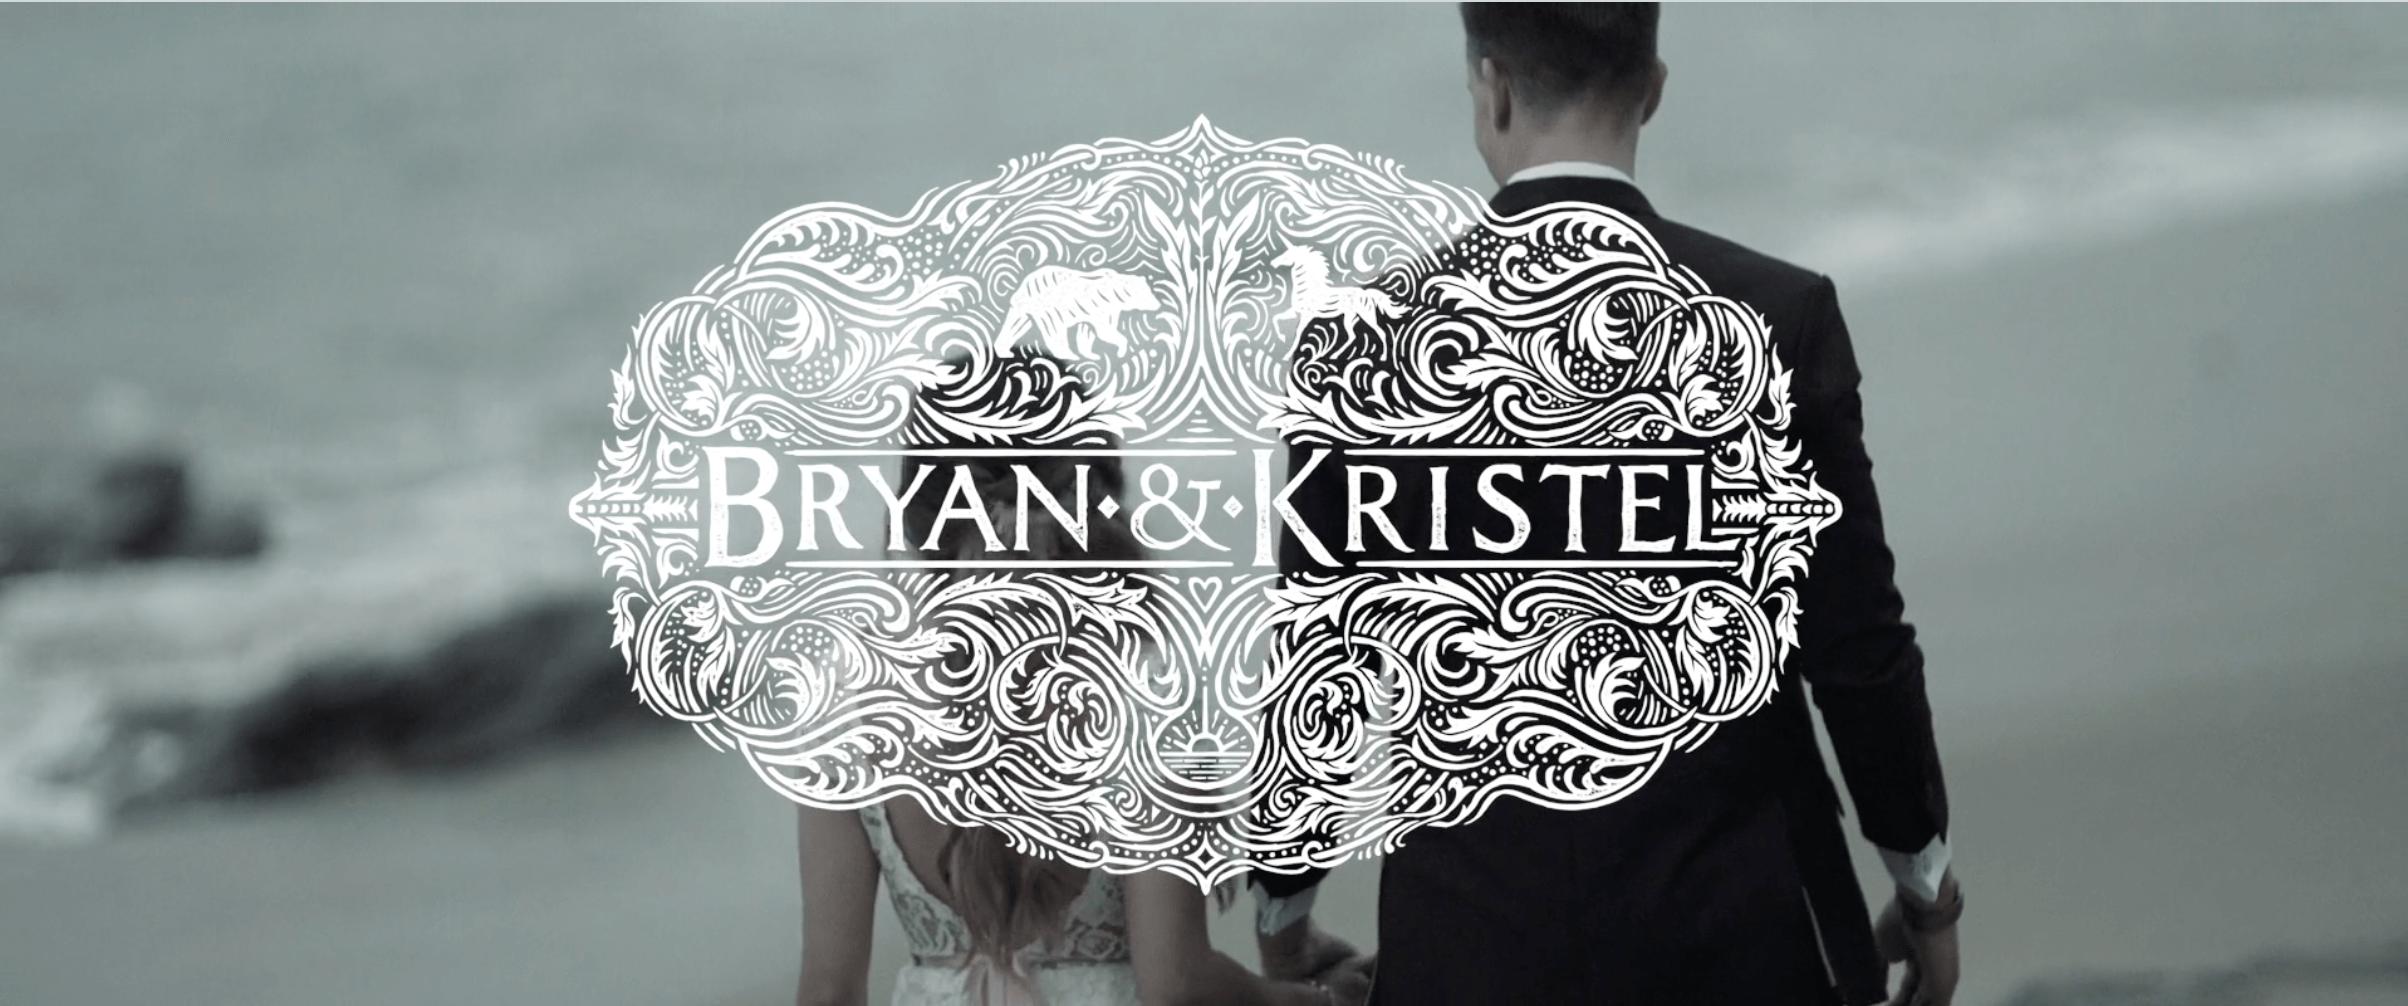 Bryan & Kristel